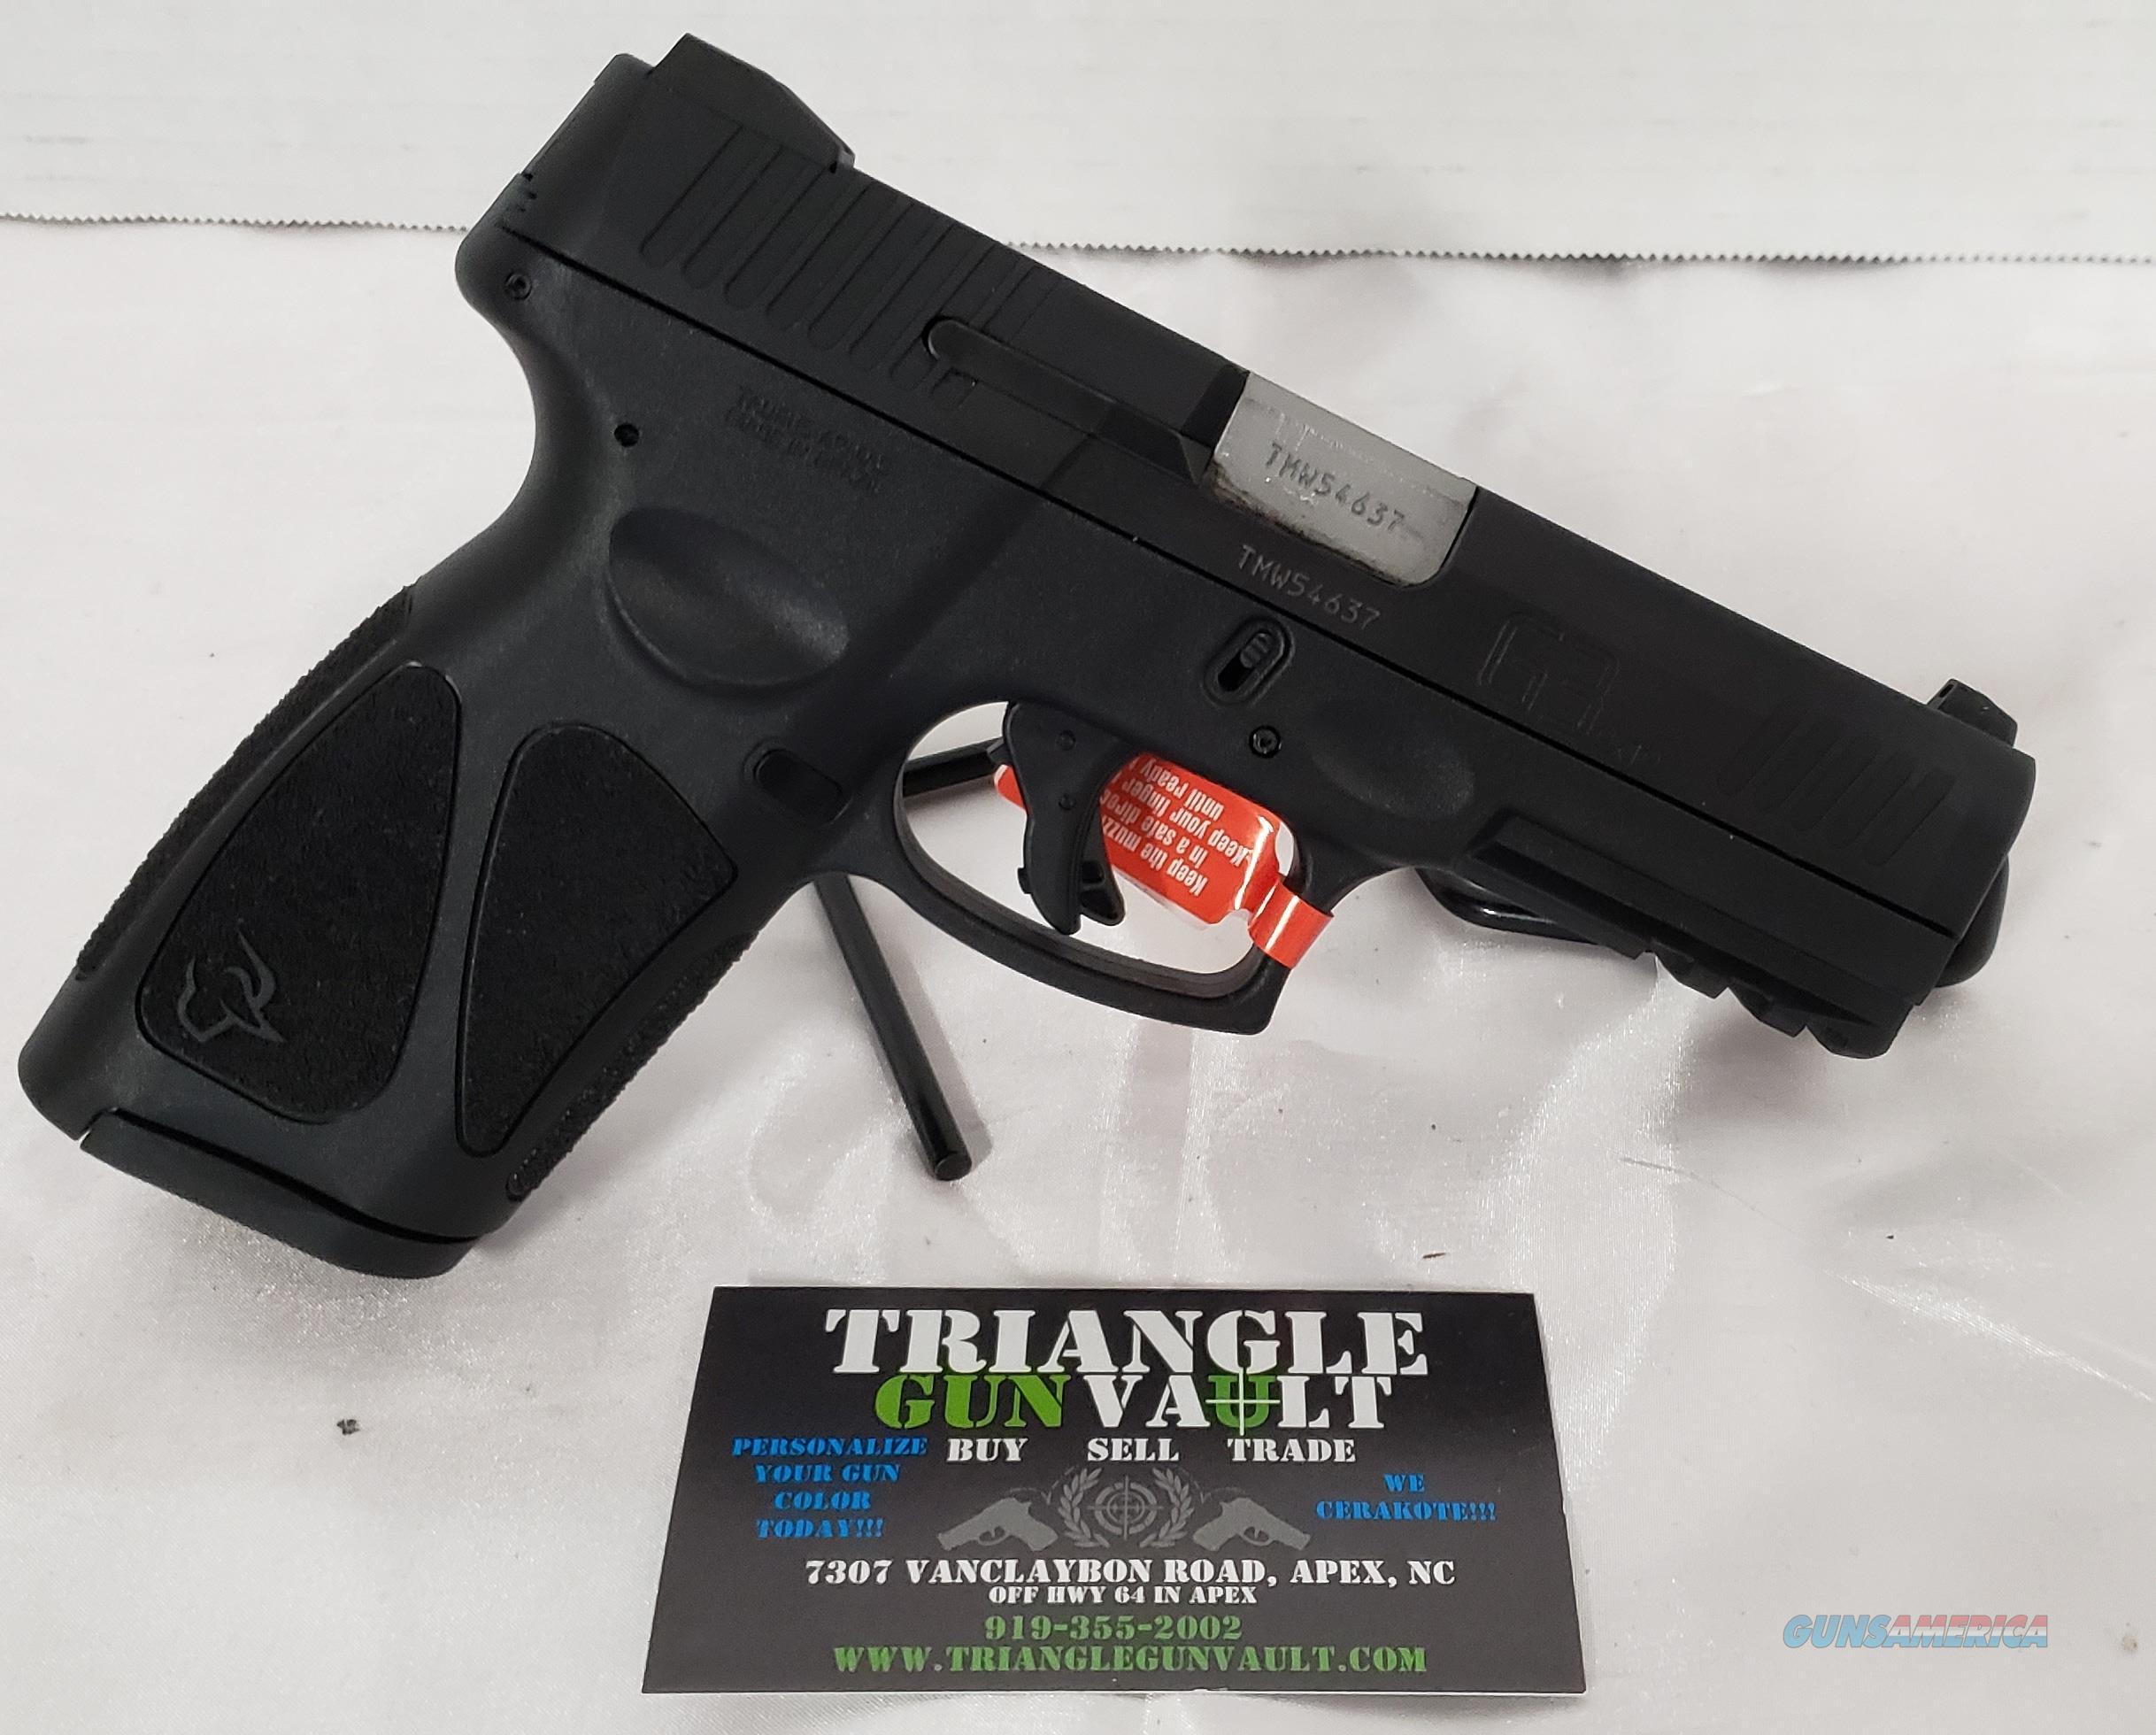 Taurus G3 9mm  Guns > Pistols > Taurus Pistols > Semi Auto Pistols > Polymer Frame